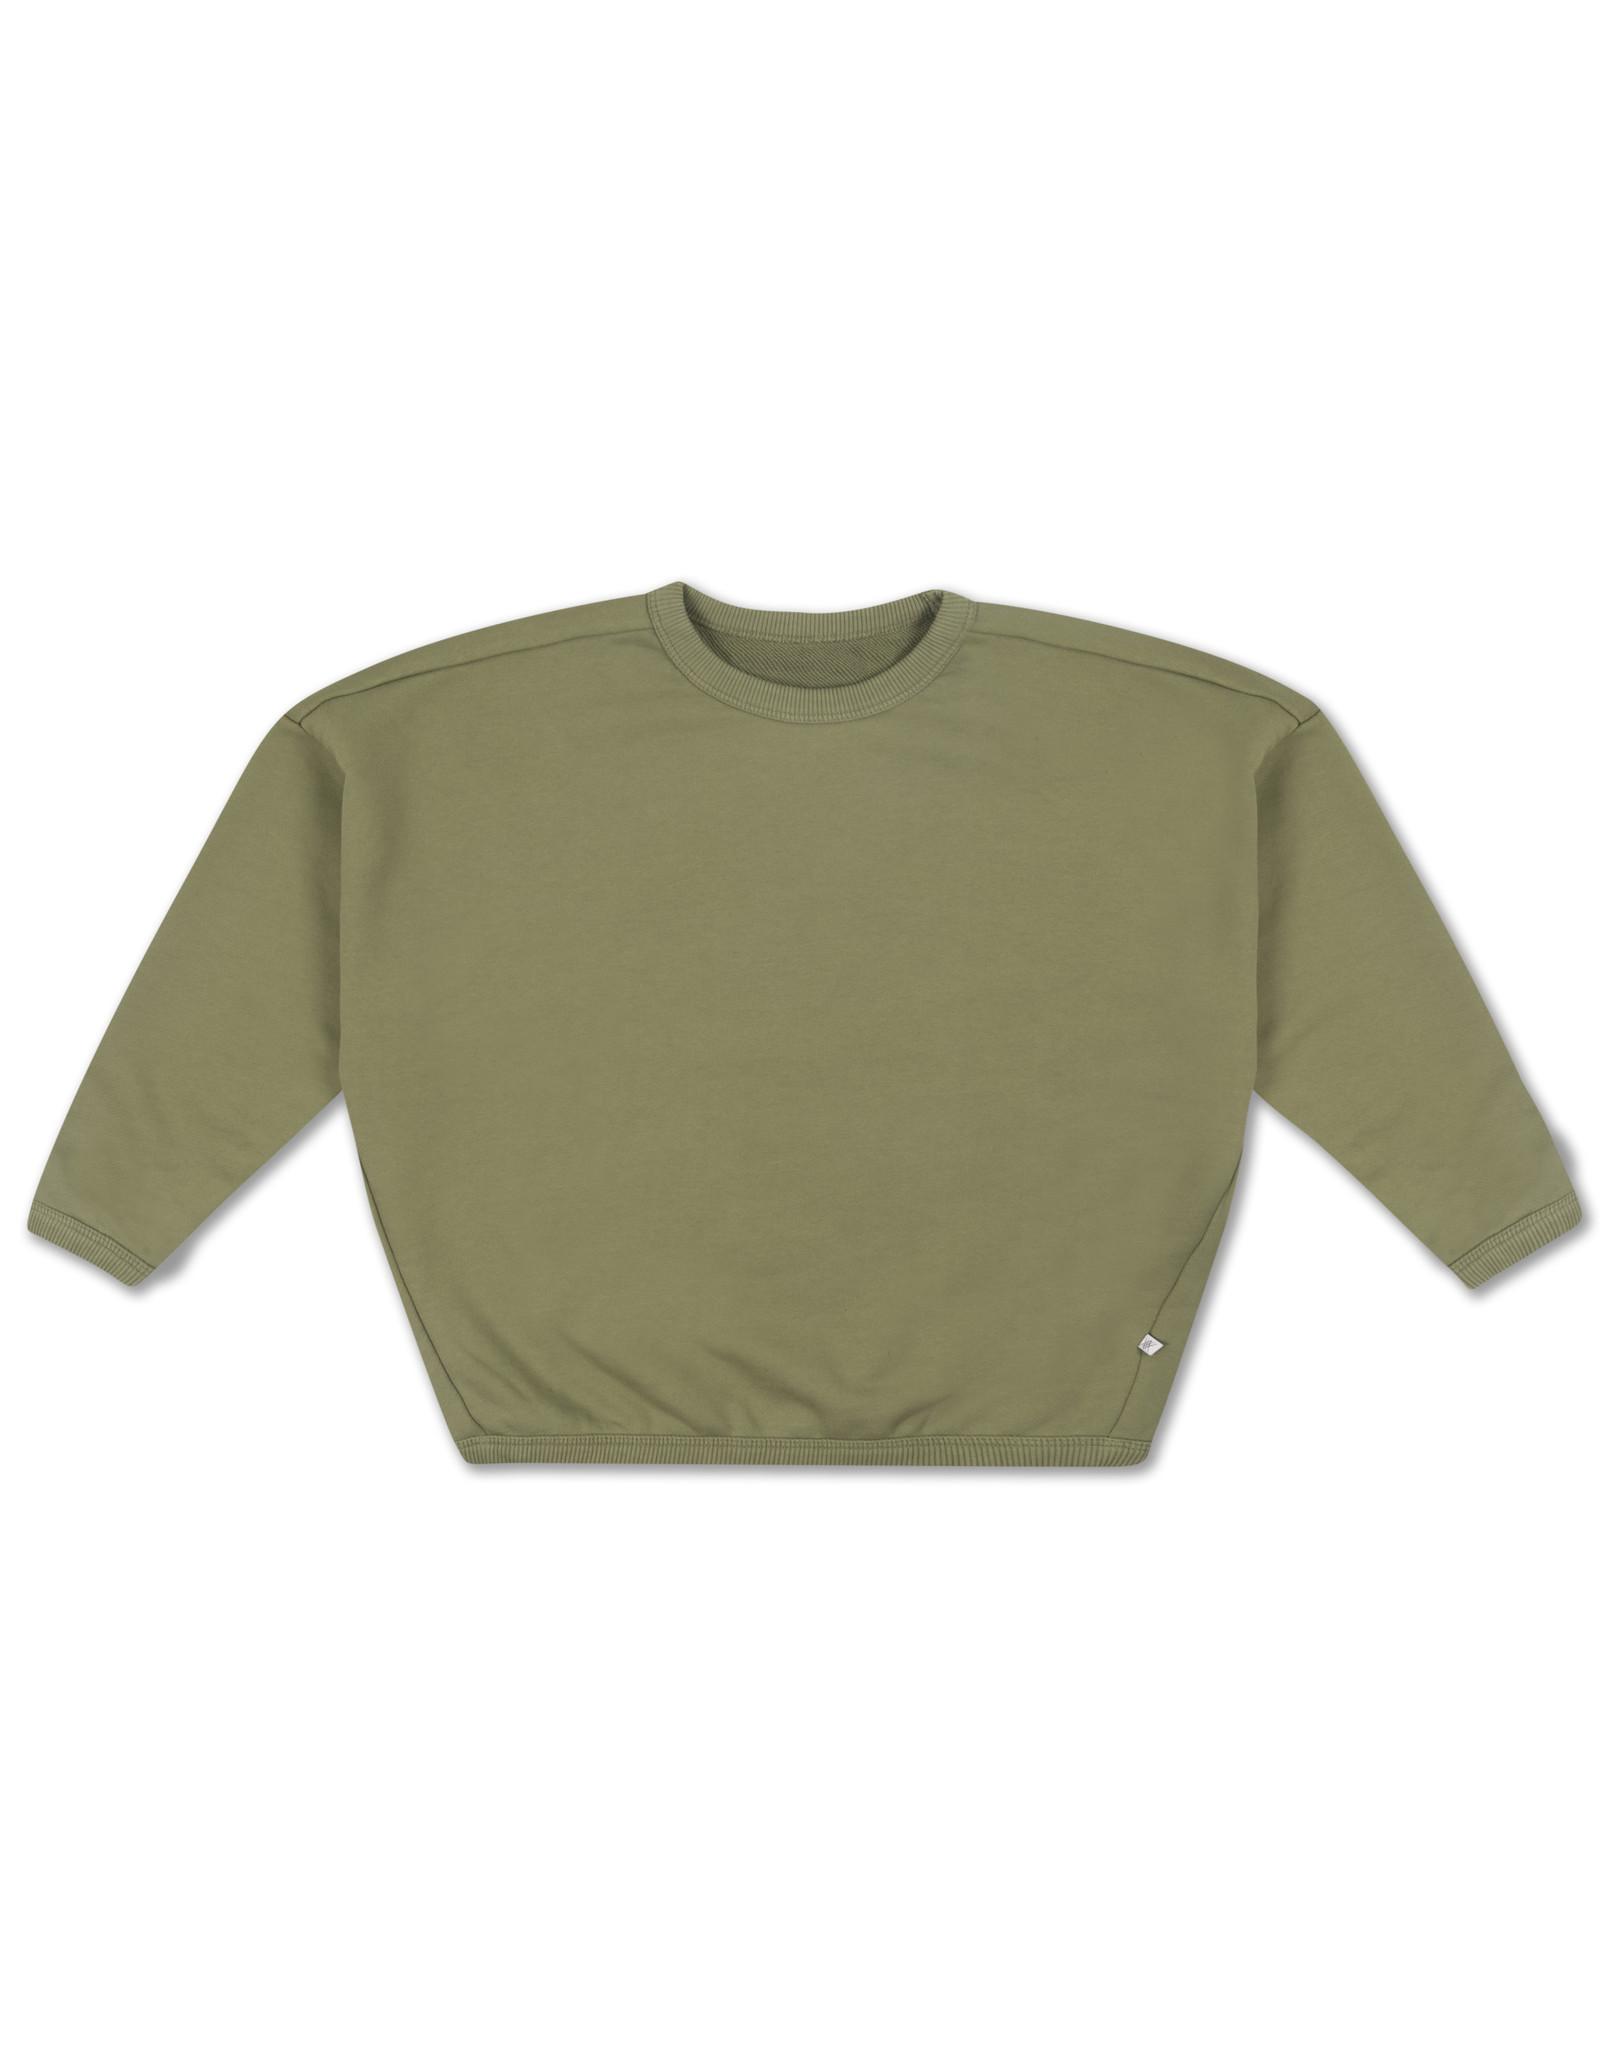 Repose Repose SS21 13 Boxy Sweater loden green